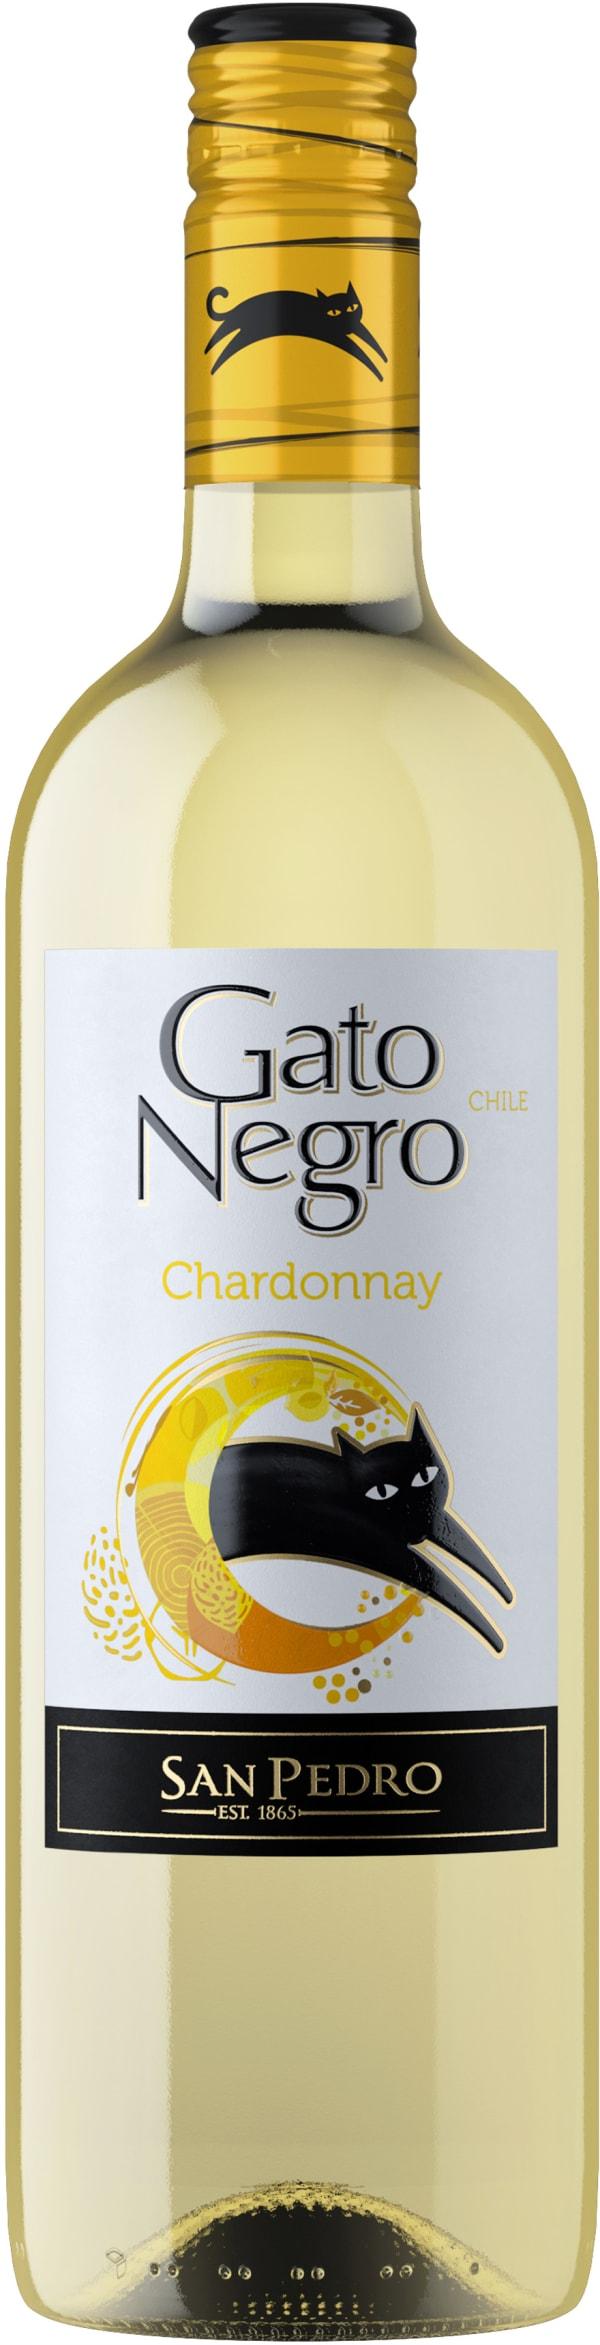 Gato Negro Chardonnay 2016